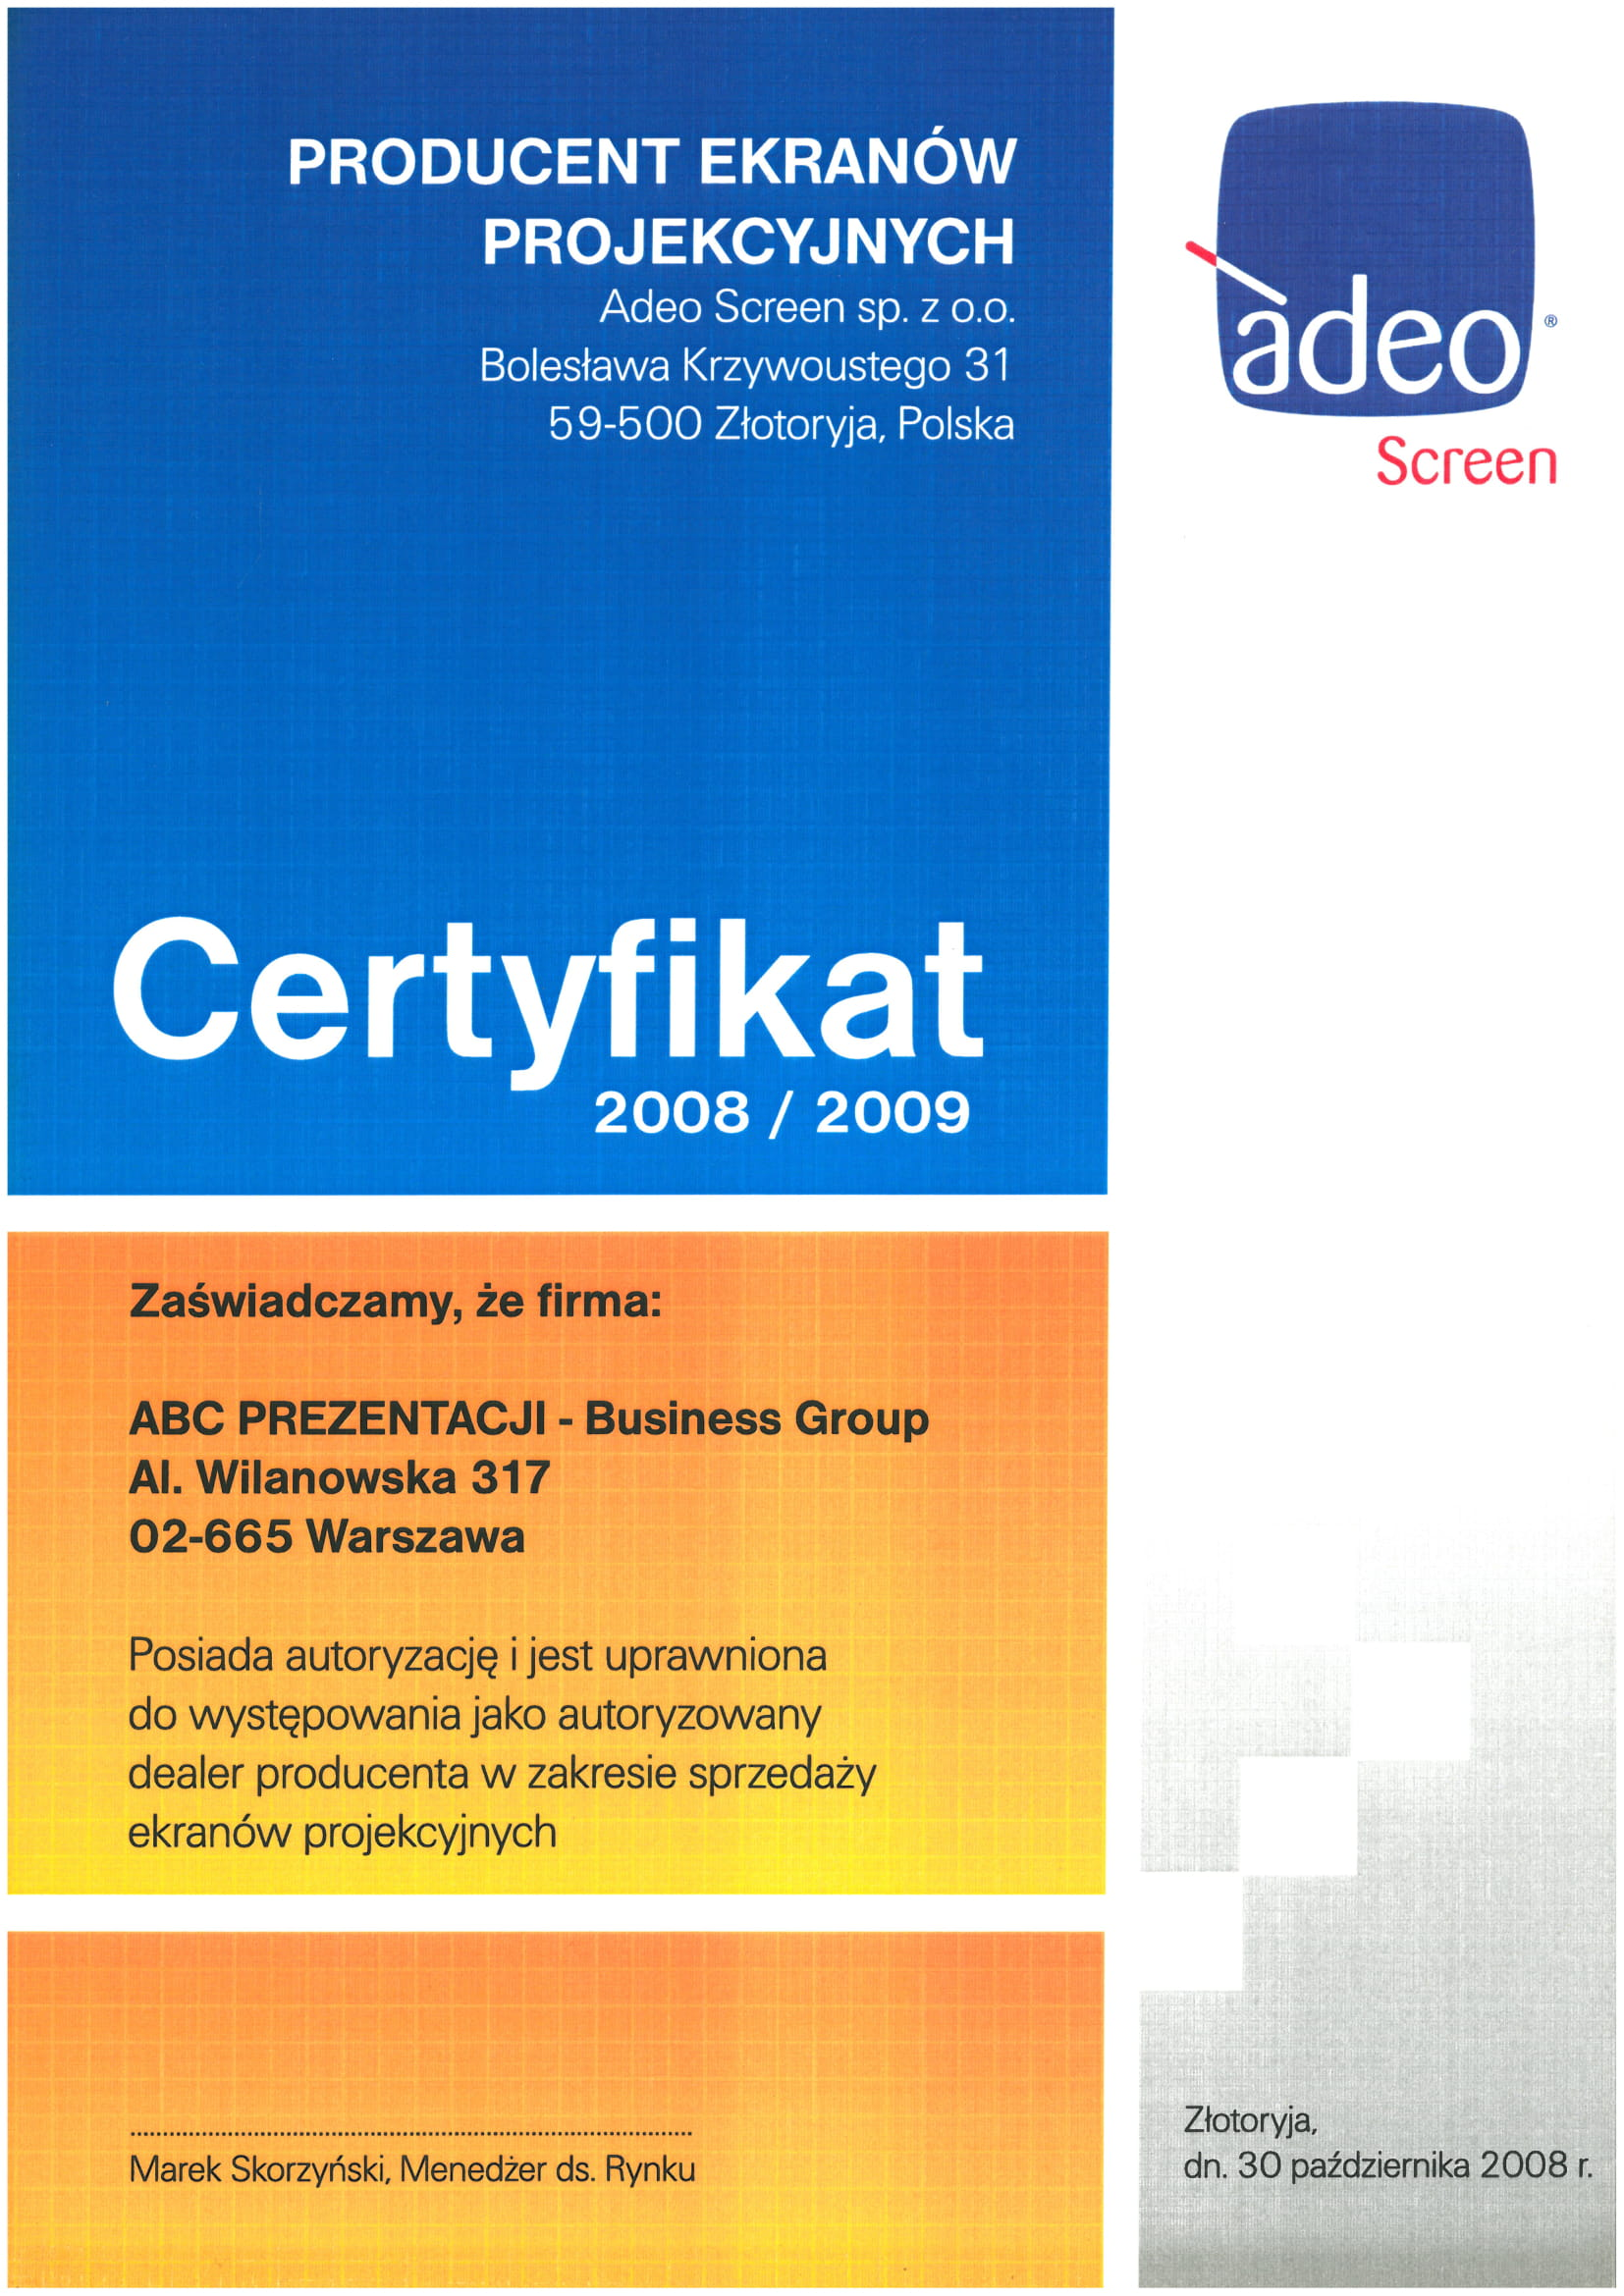 Certyfikat Adeo